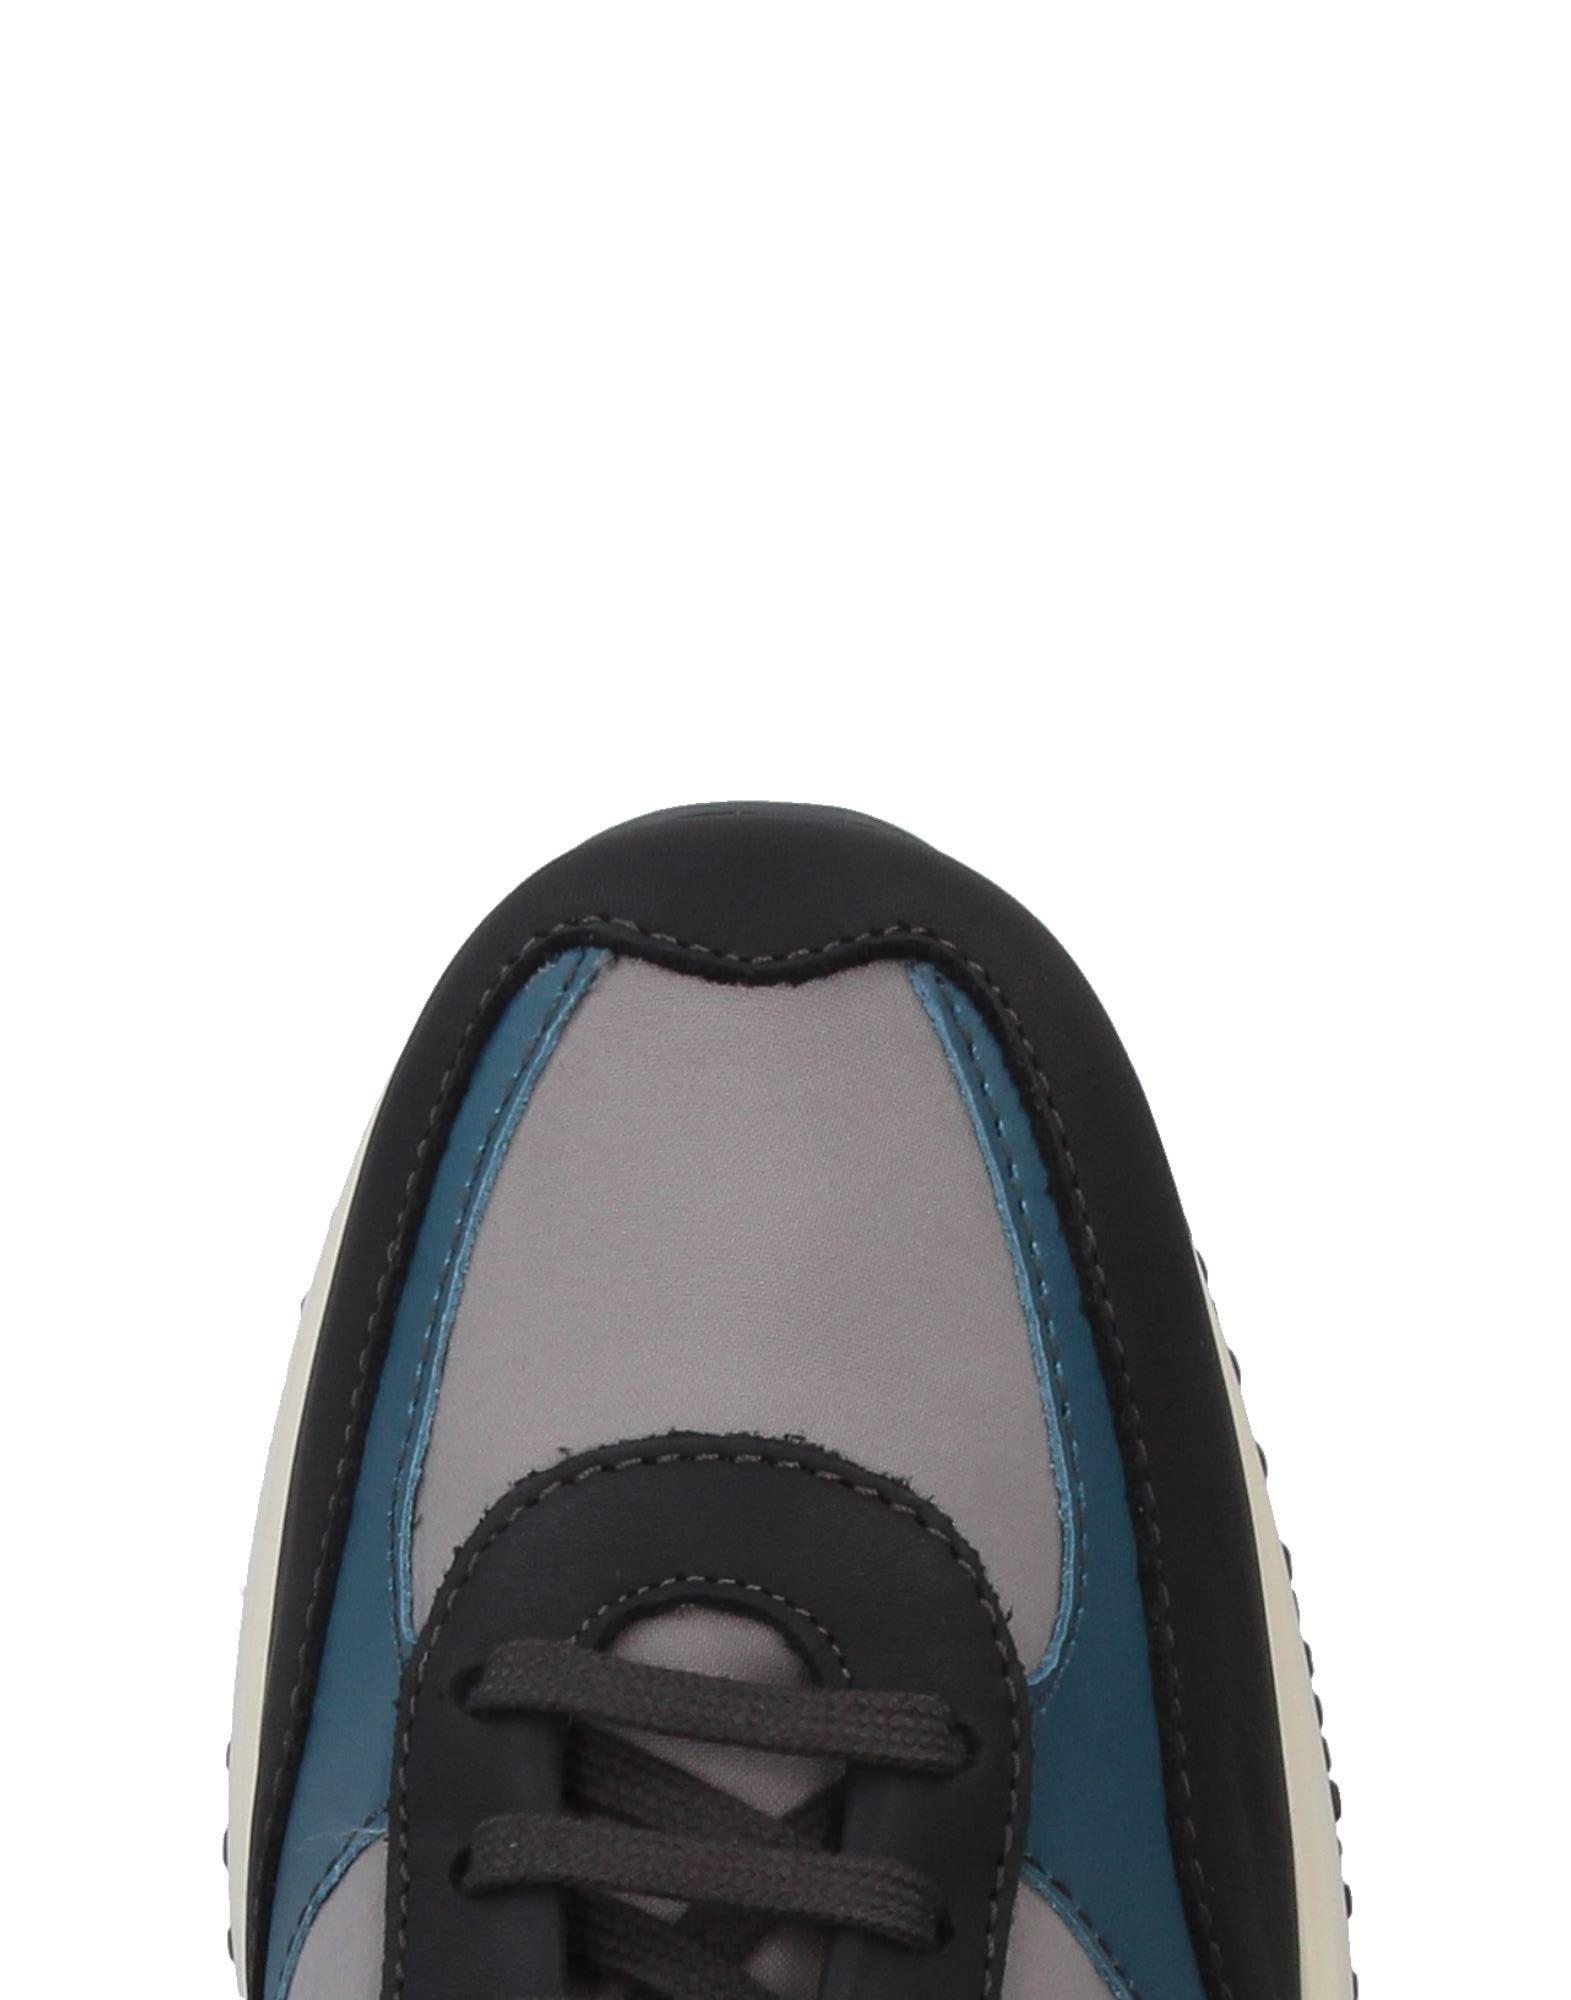 Hogan Sneakers Herren Heiße  11412373SD Heiße Herren Schuhe 6a37d0